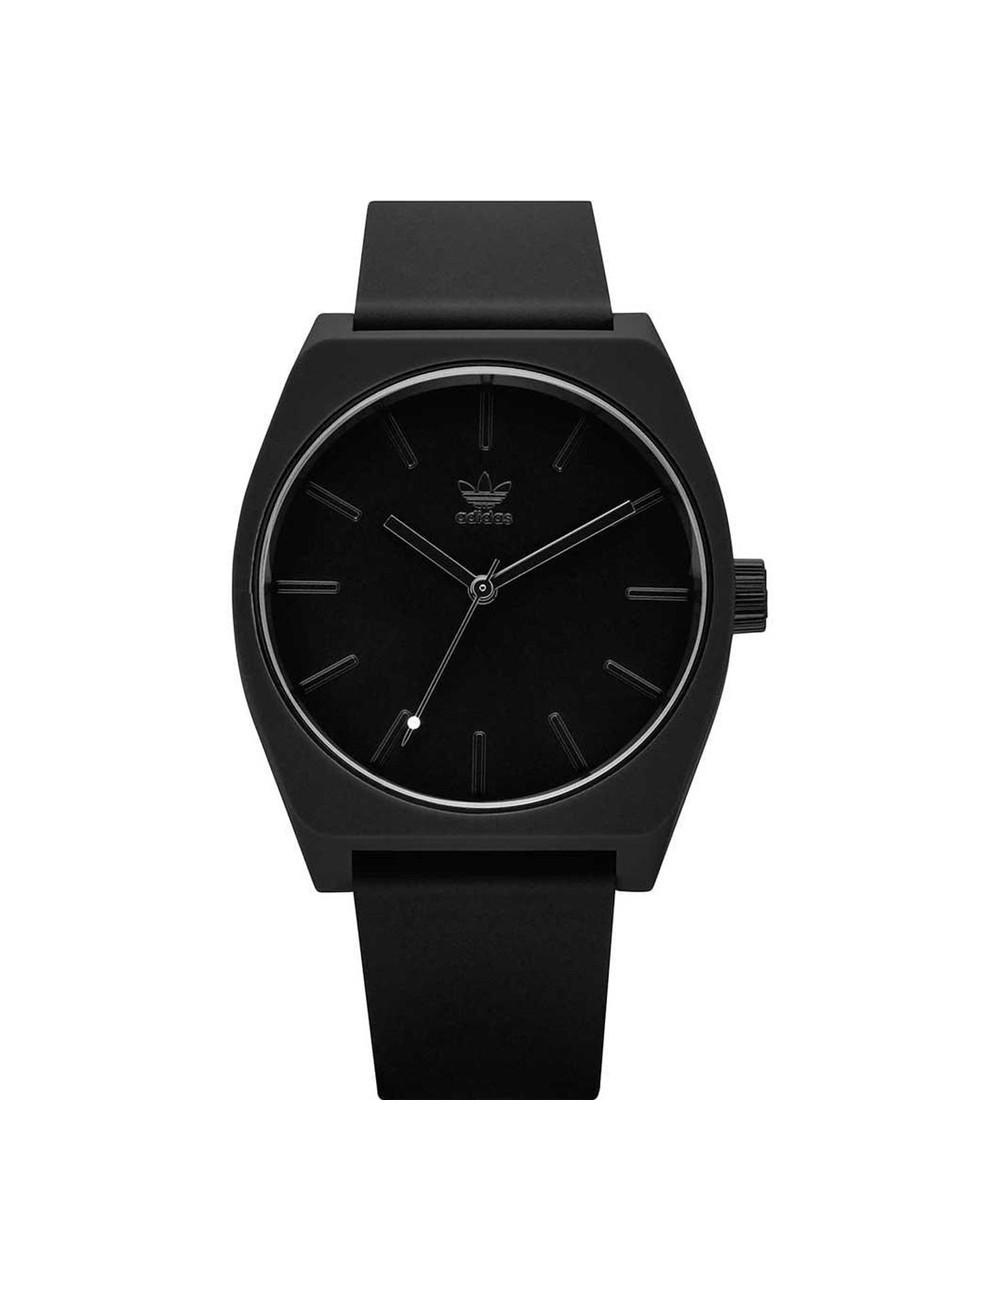 Adidas Process SP1 Z10001 Mens Watch